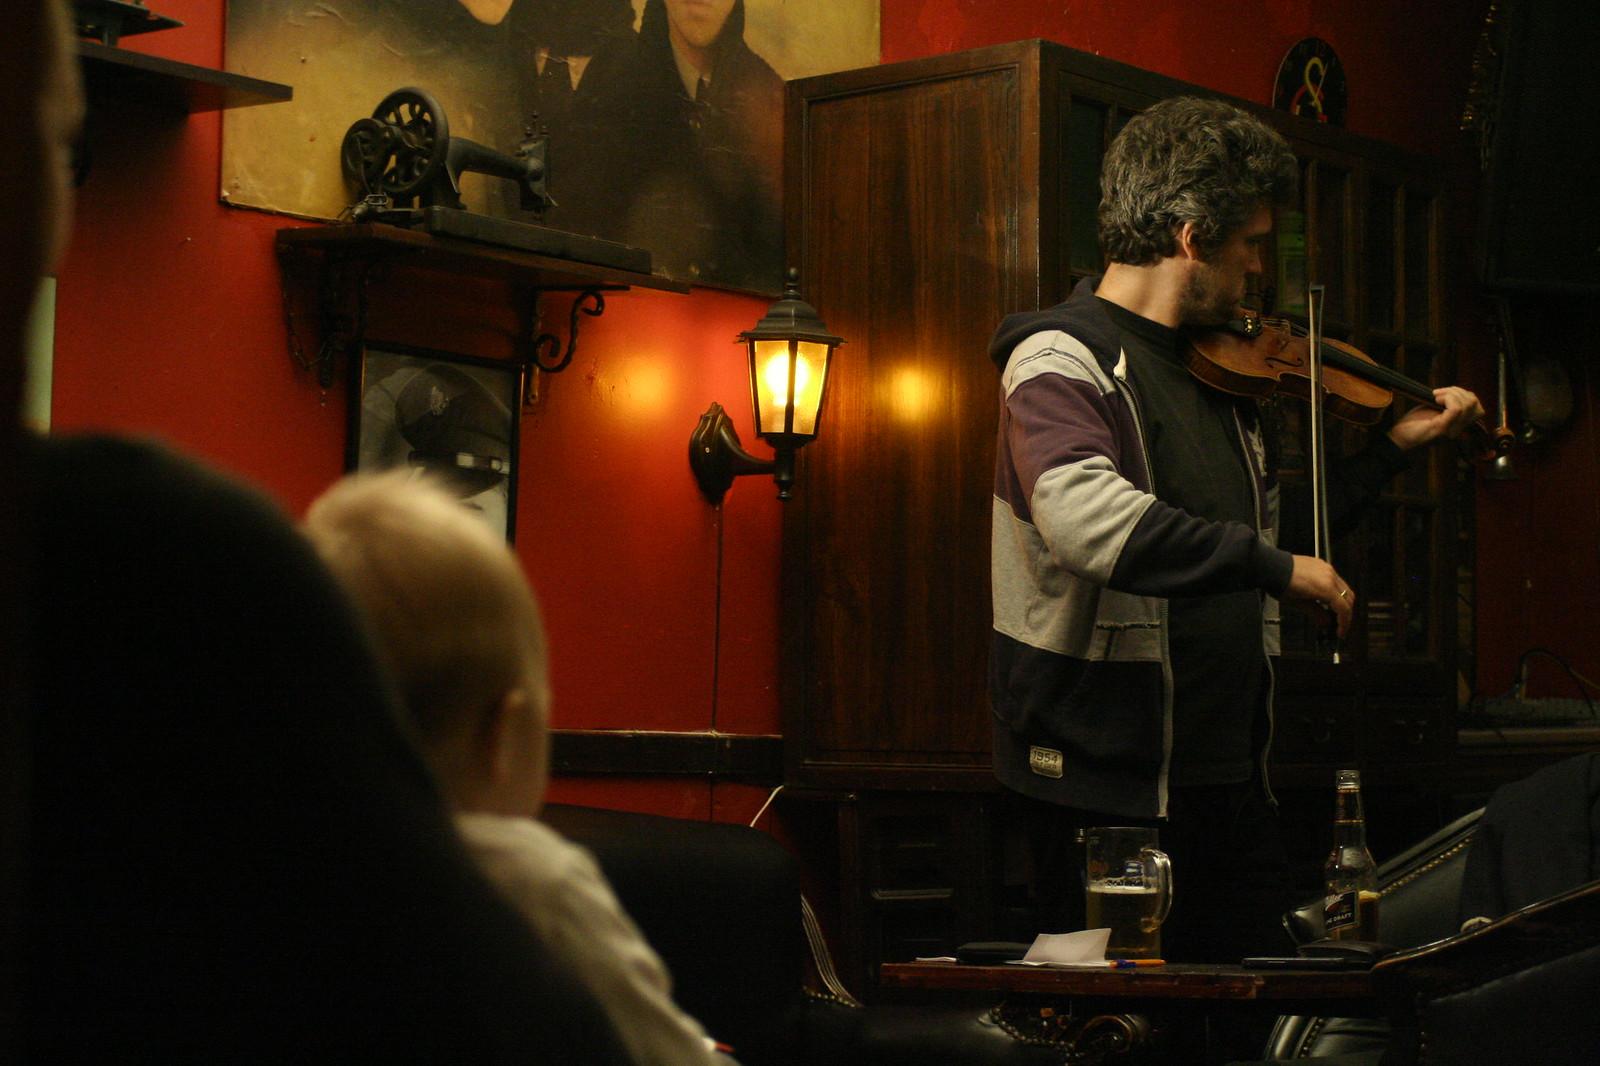 Neve watching Bojan play the violin.